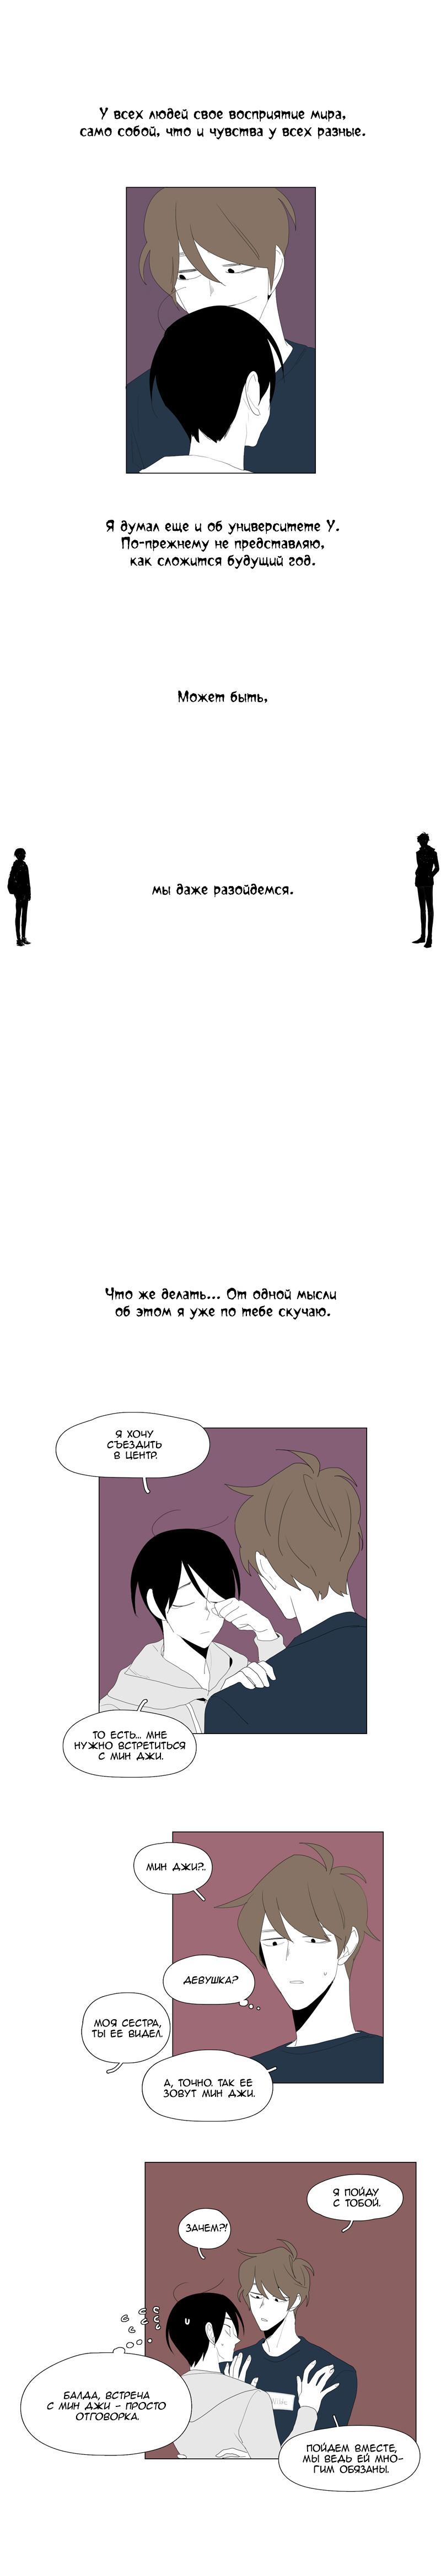 https://r1.ninemanga.com/comics/pic2/33/27873/314633/1482174982649.jpg Page 8